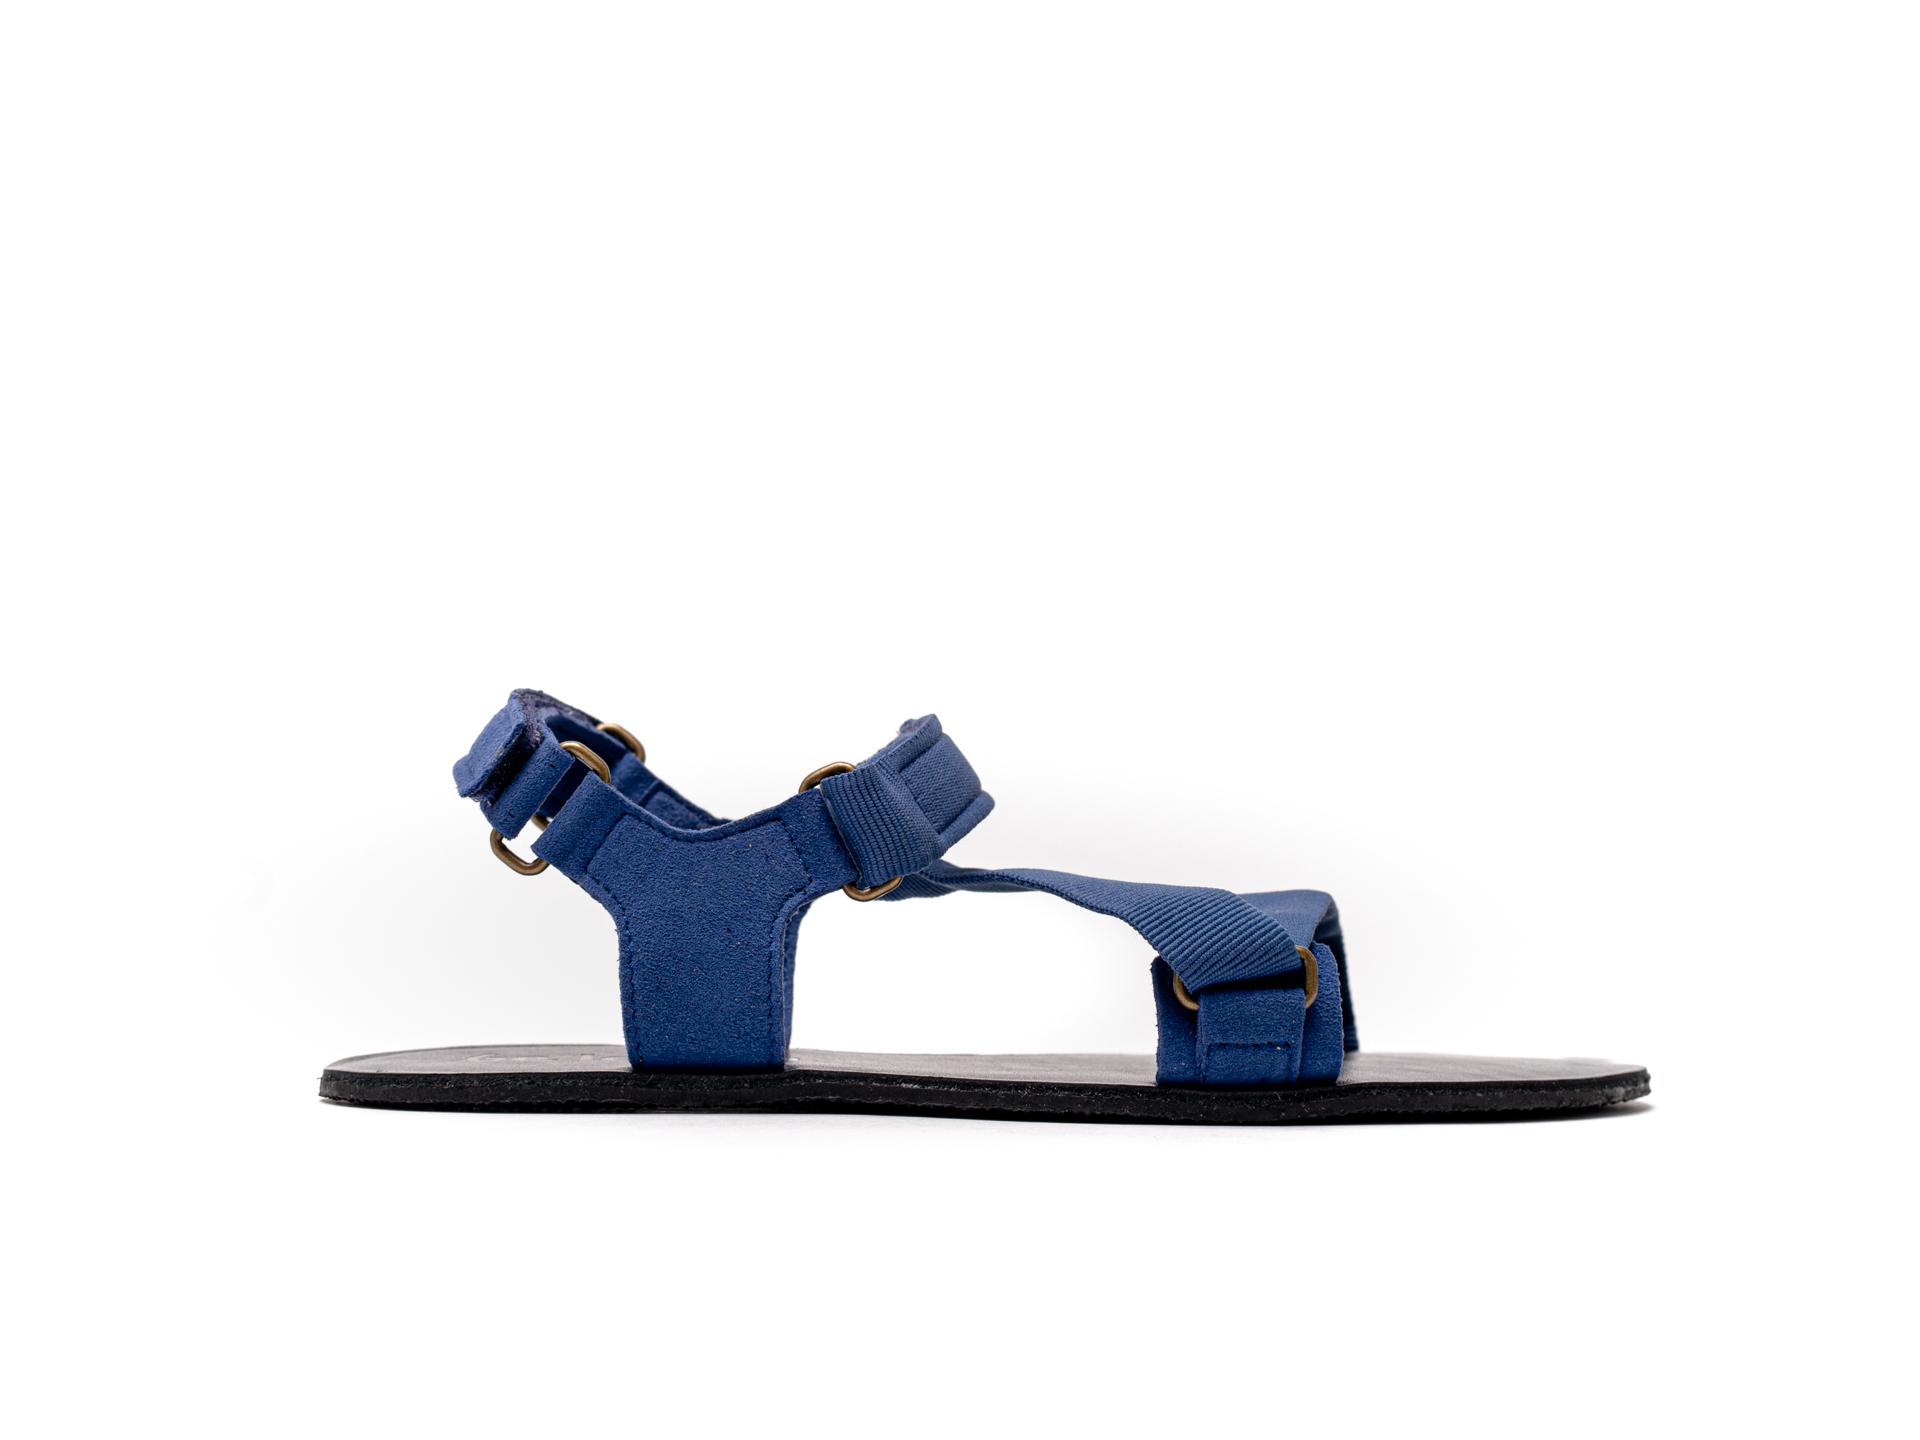 Barefoot Sandals - Be Lenka Flexi - Blue 42